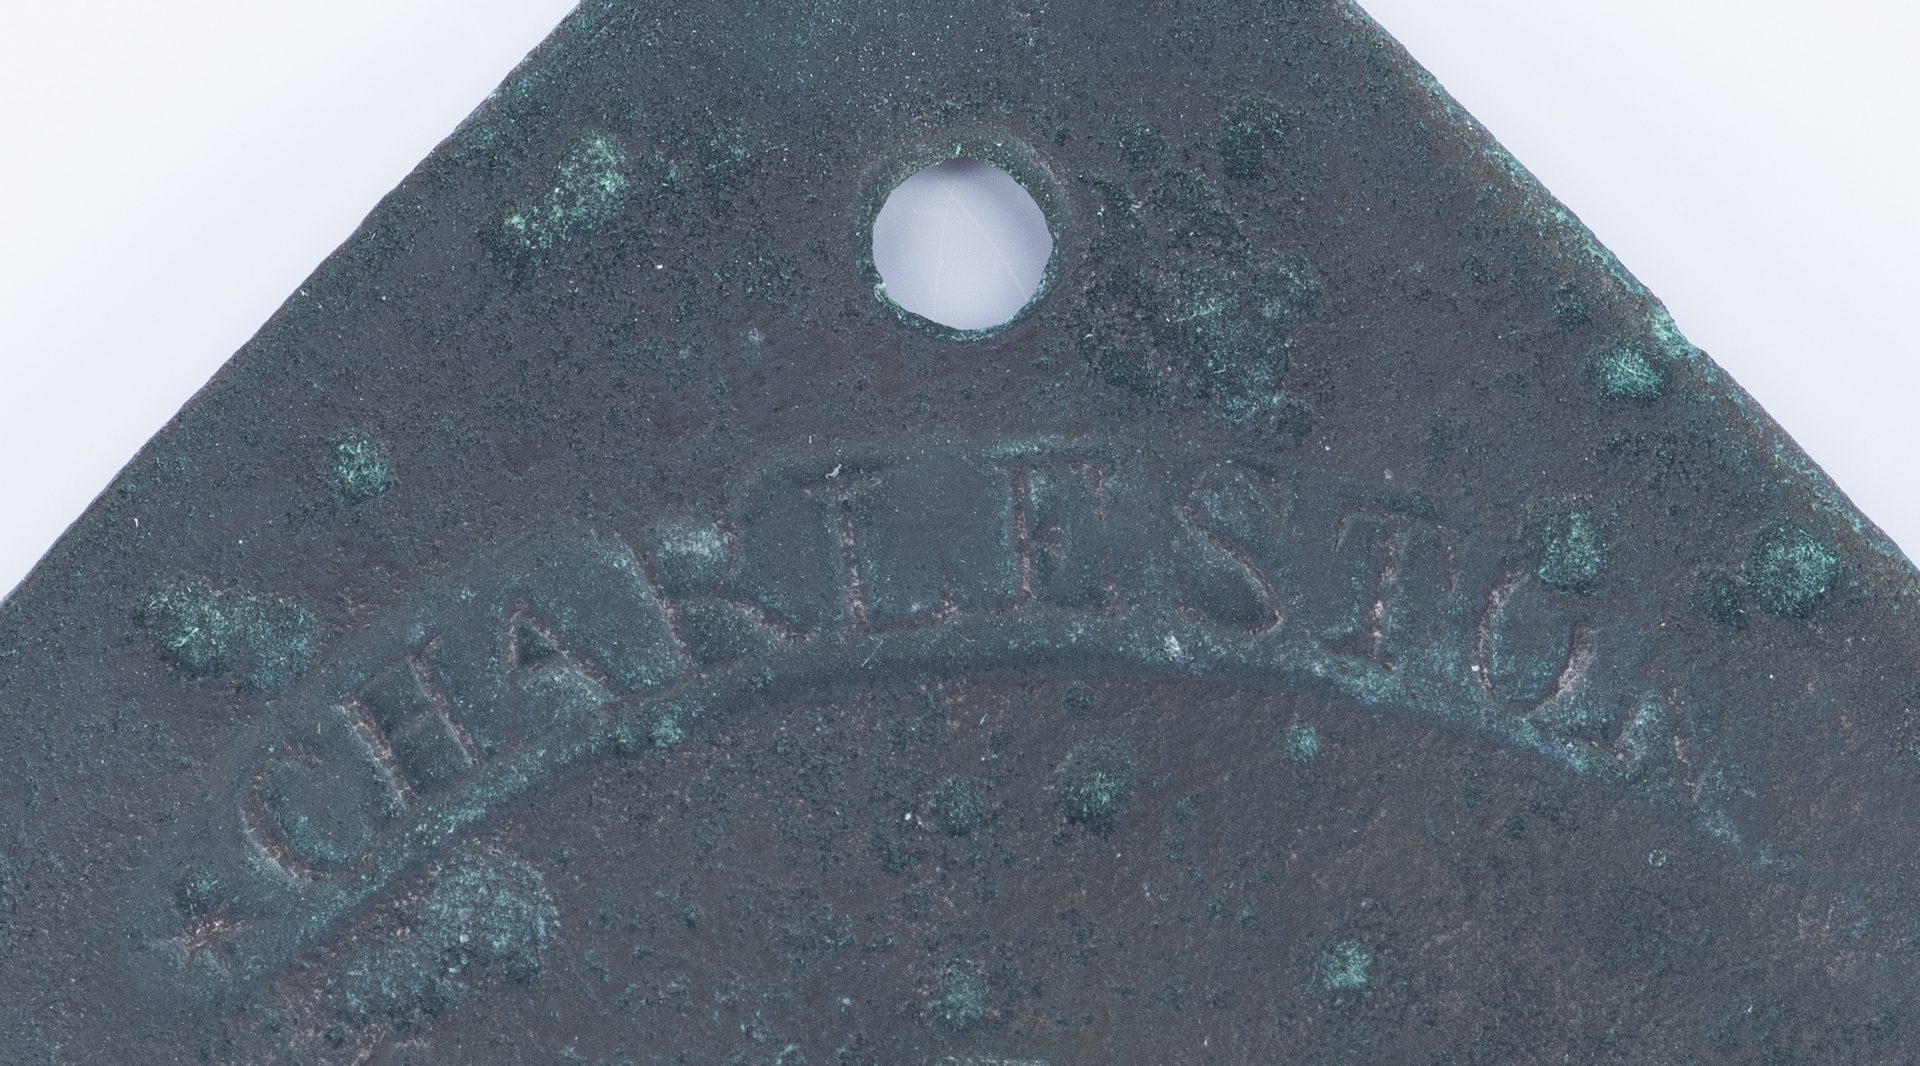 Lot 338: 1815 Charleston Lafar Fisher Slave Hire Badge, Number 125